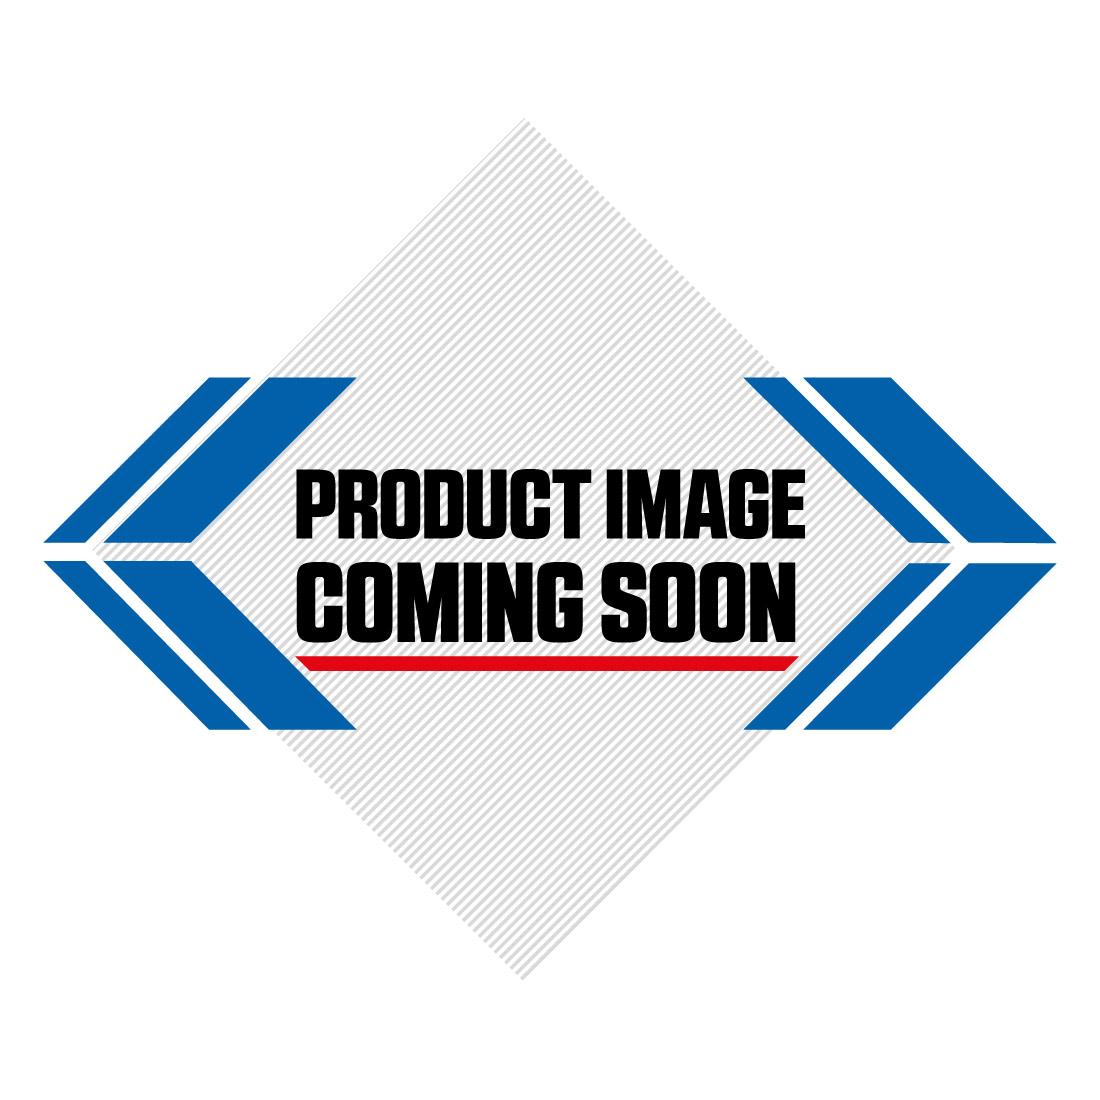 Suzuki Plastic Kit RMZ 450 (2013) OEM Factory Image-1>